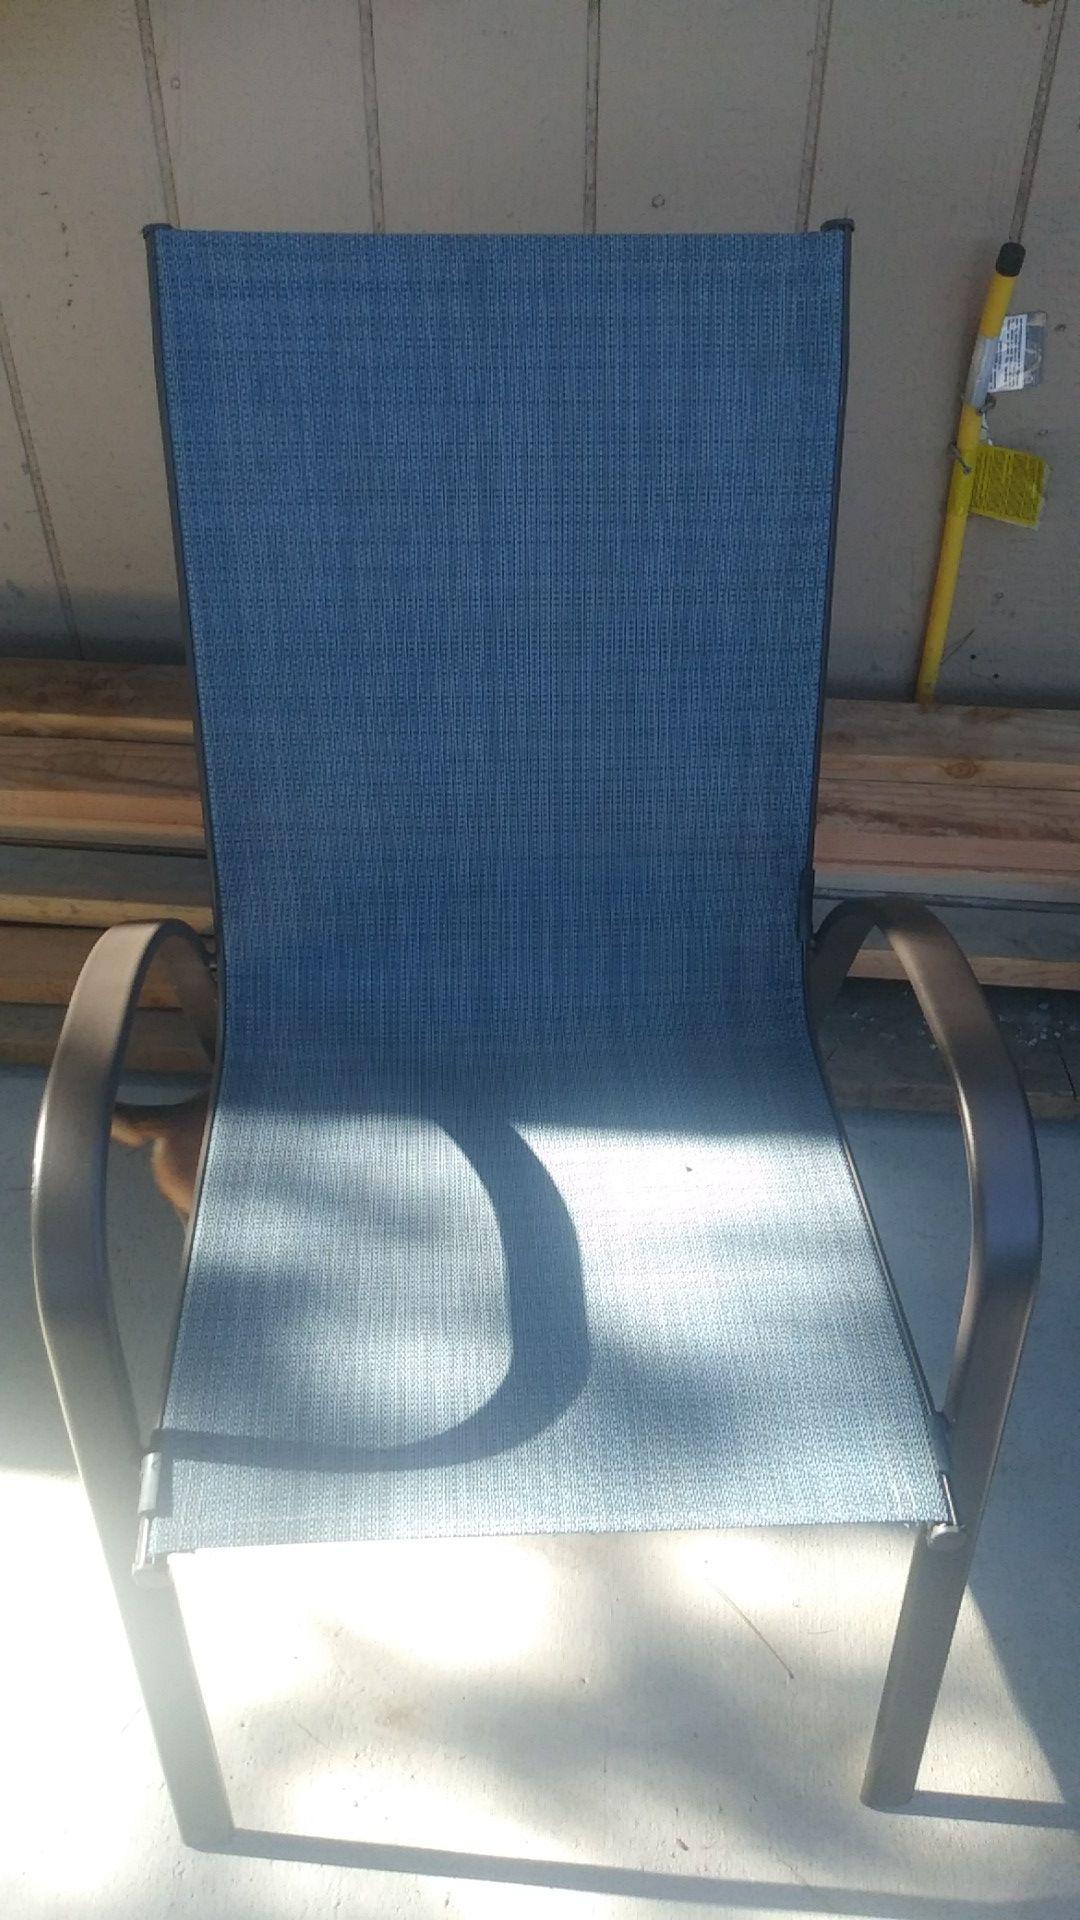 Padio chairs